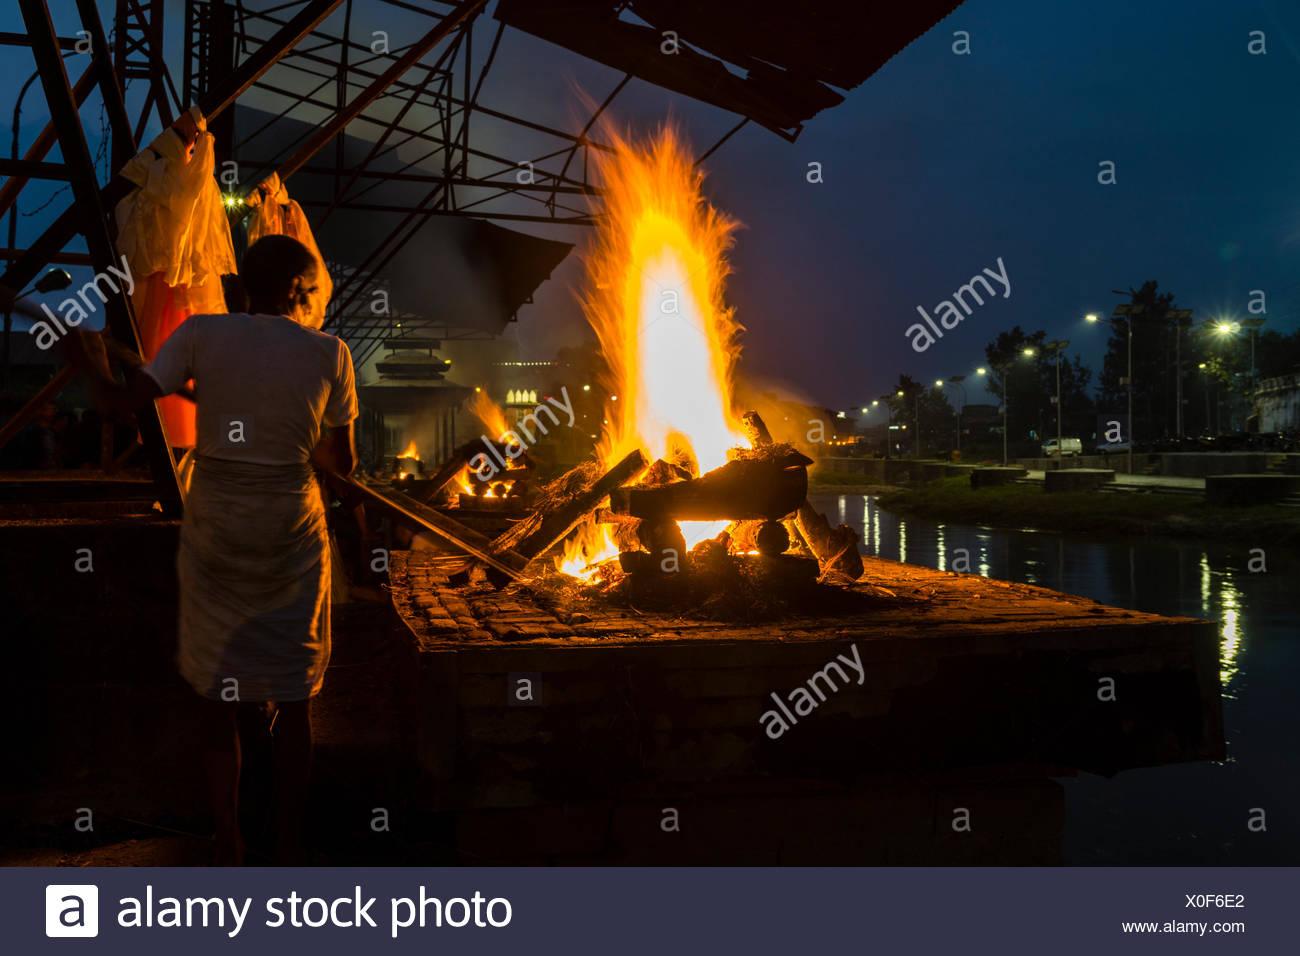 Cremation of a dead body at the burning ghats at night, Pashupatinath temple, banks of Bagmati River, Kathmandu - Stock Image